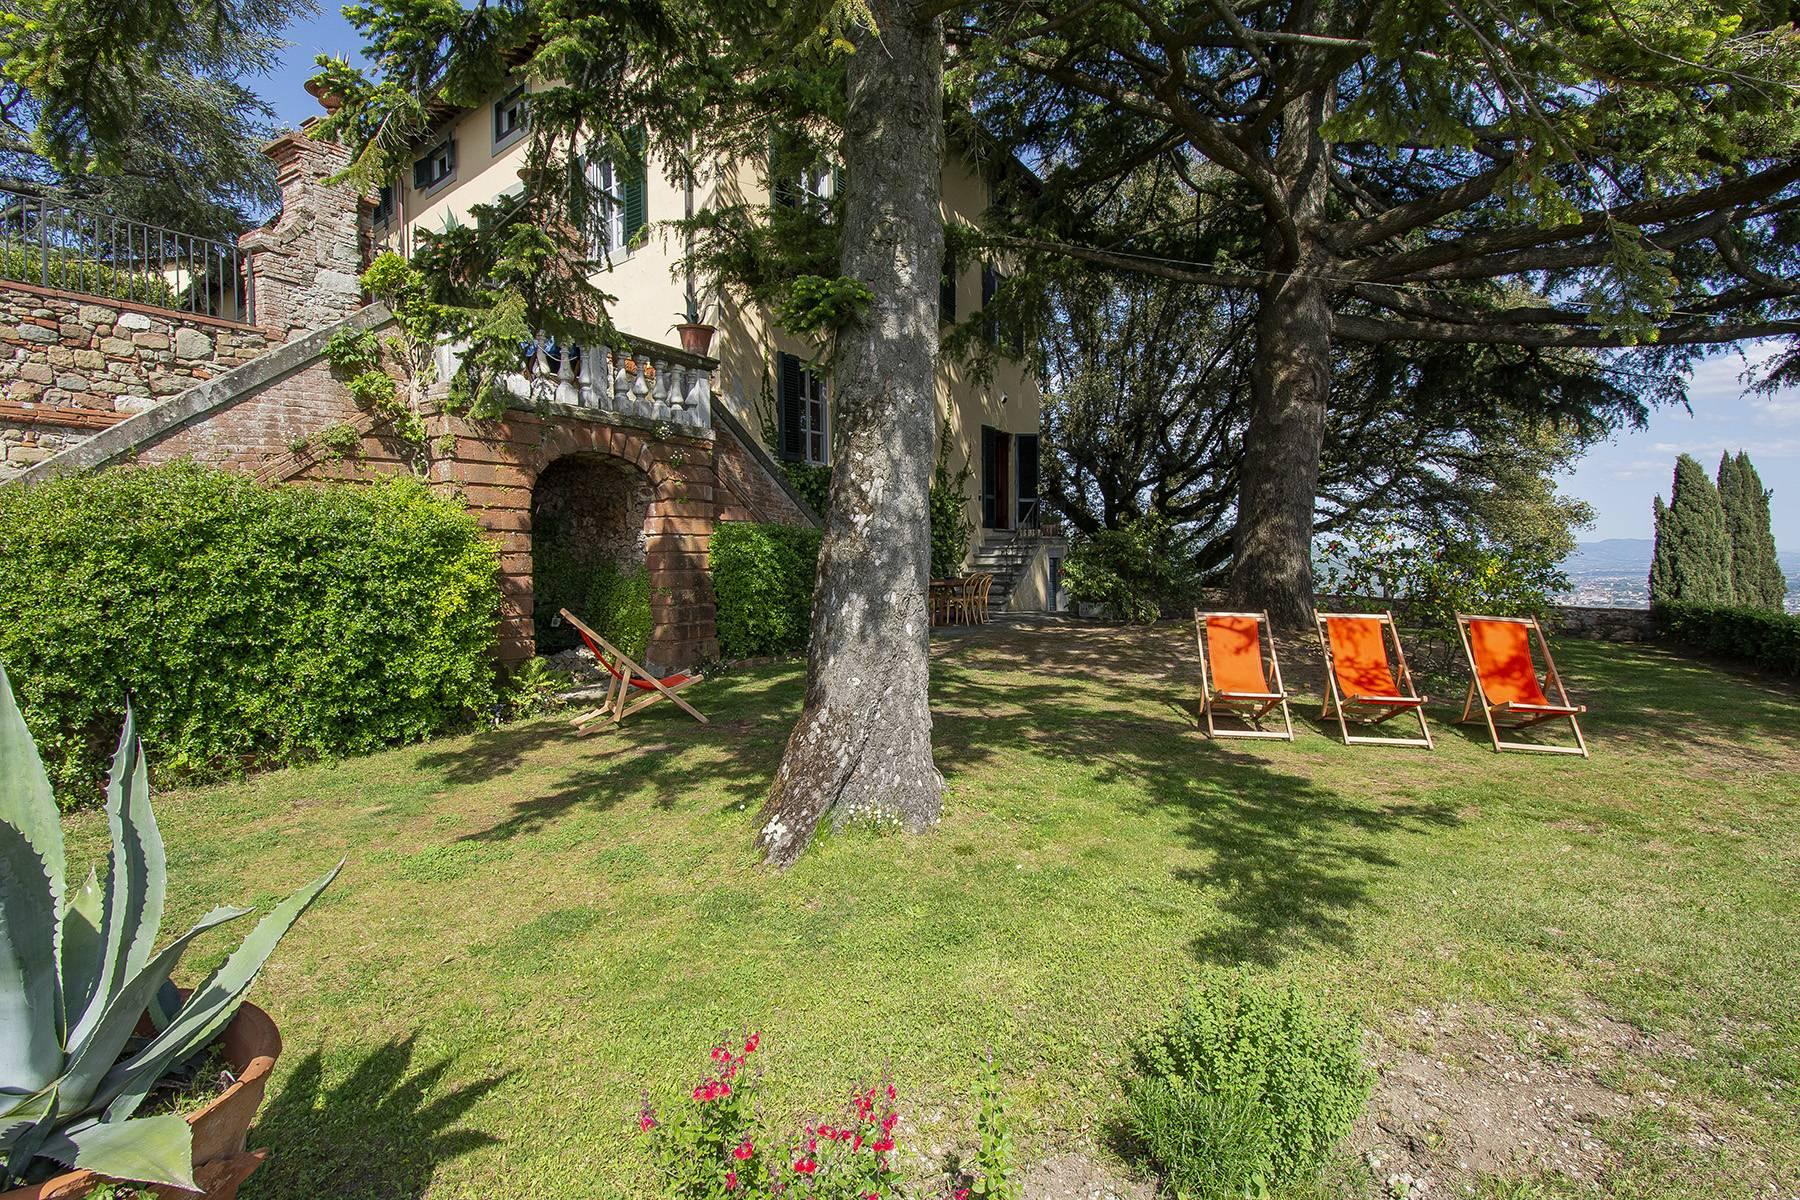 Villa in Vendita a Capannori: 5 locali, 380 mq - Foto 29